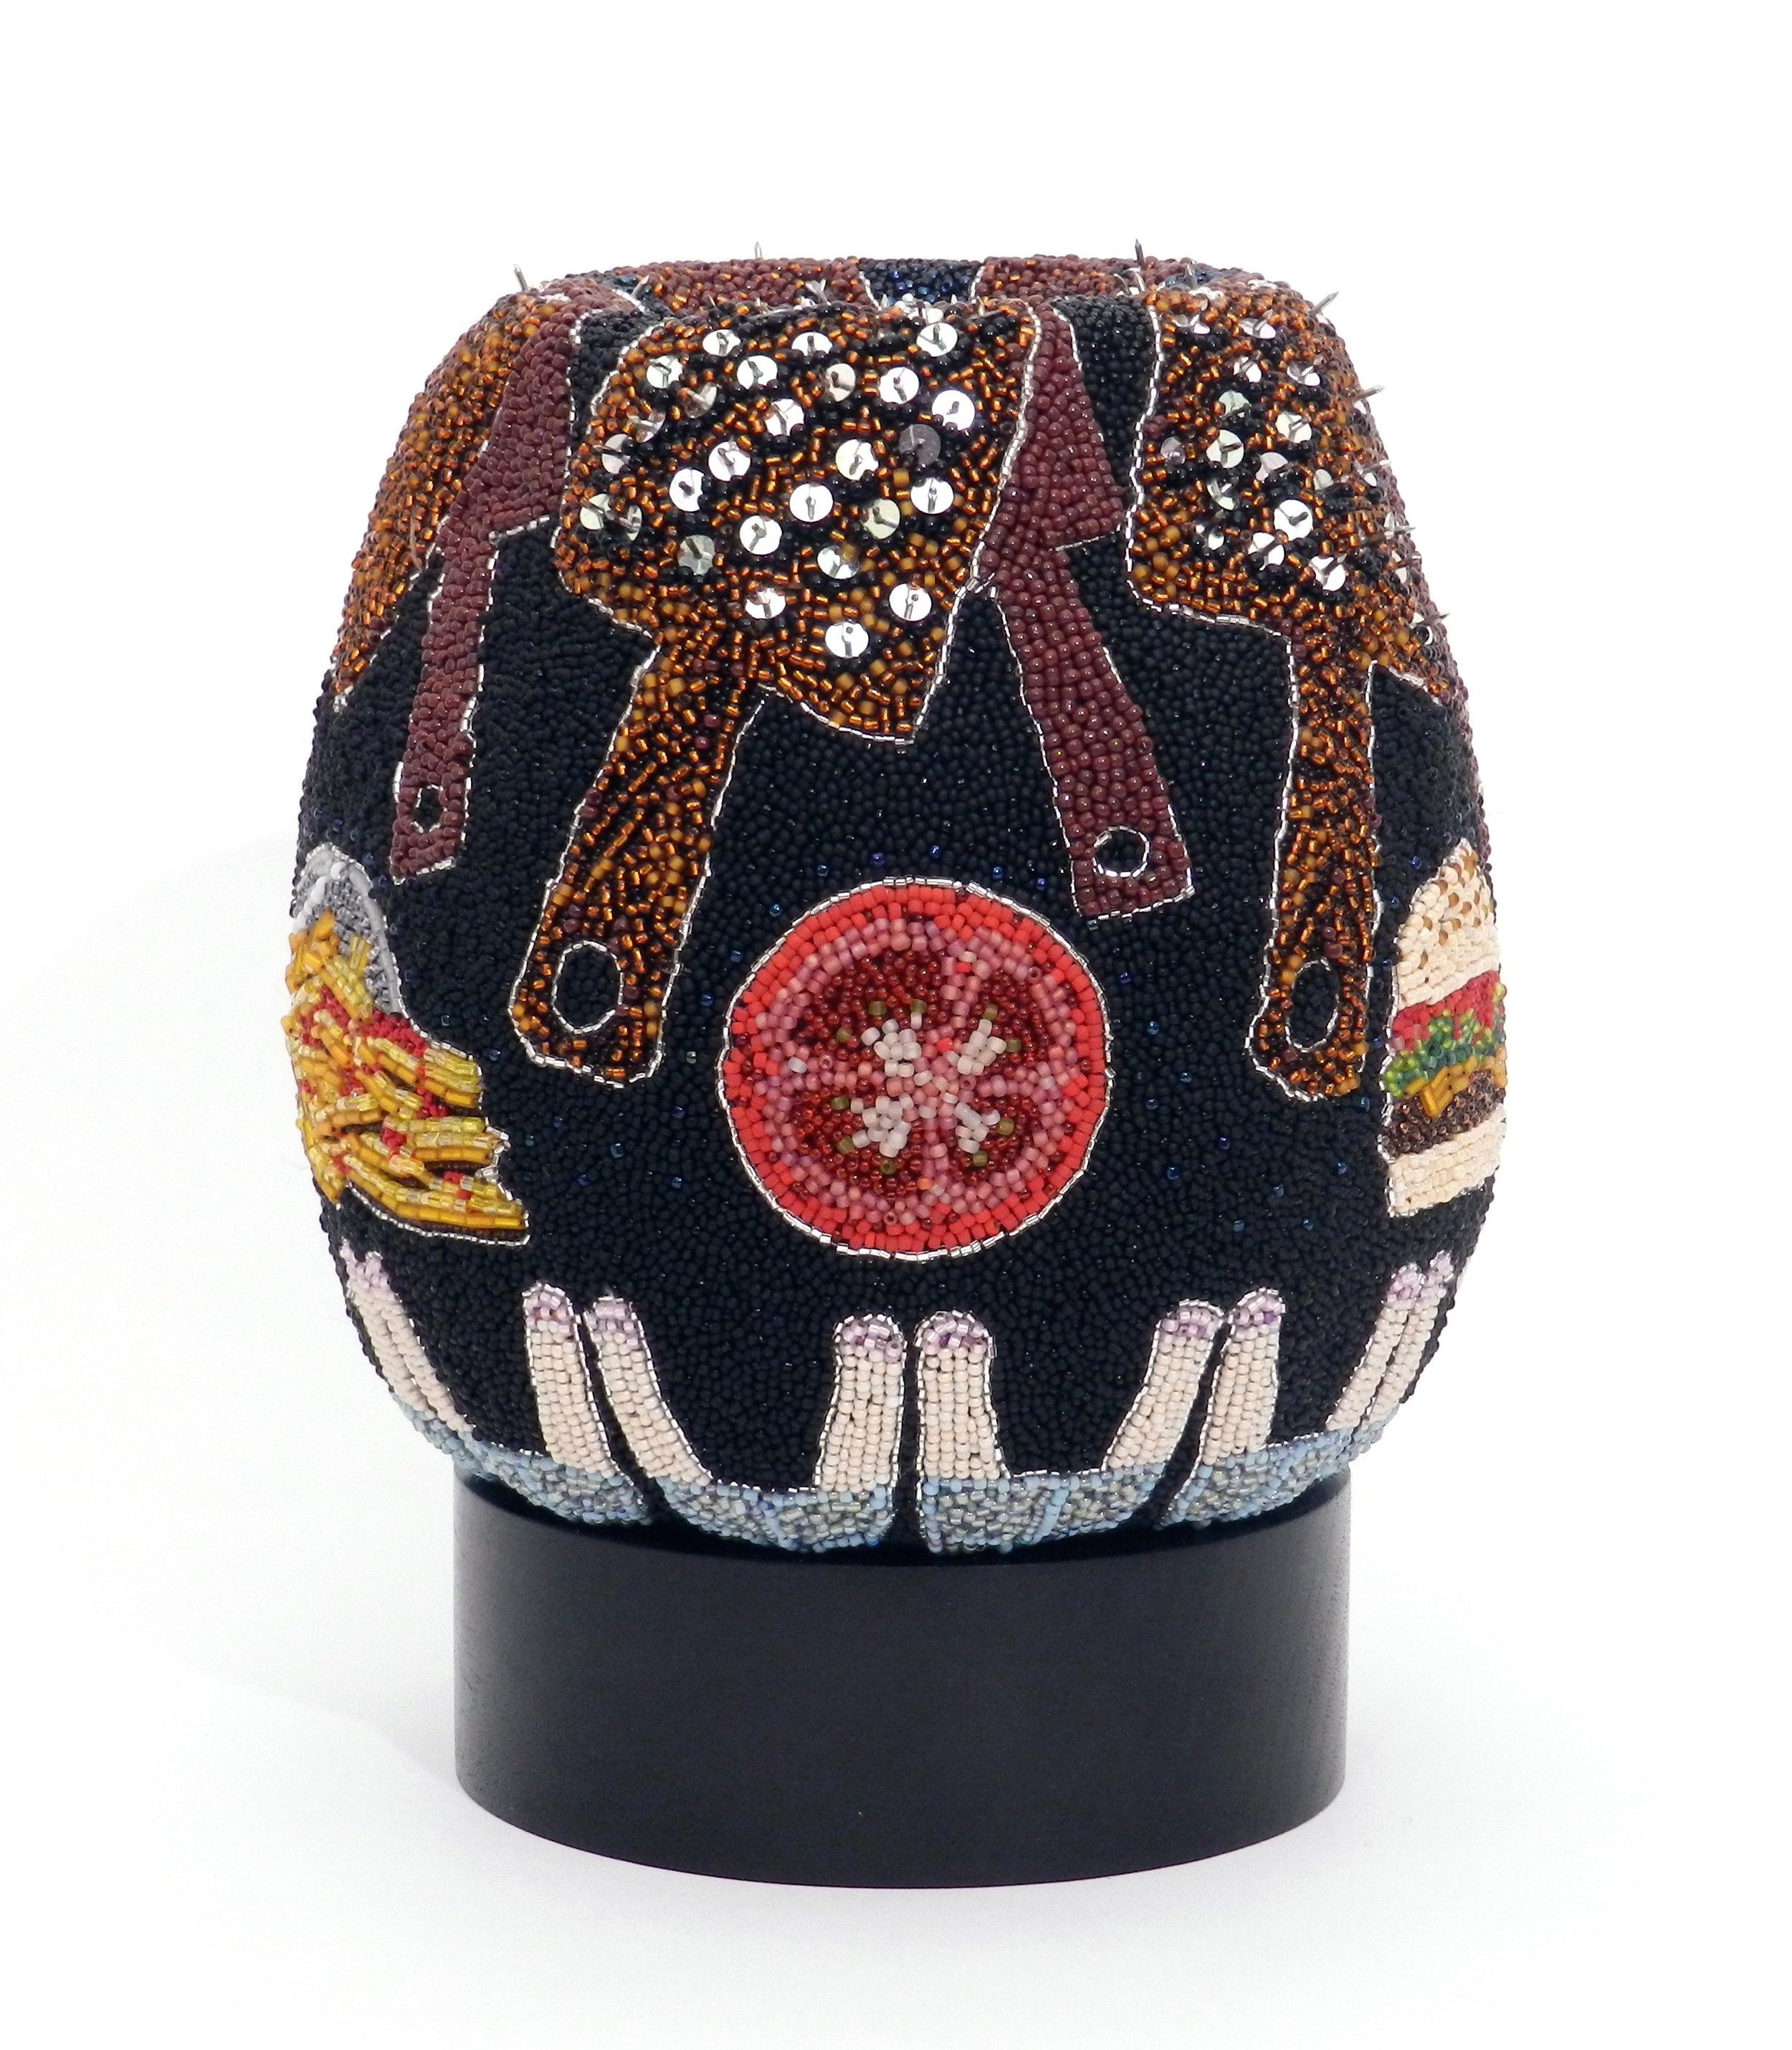 Stuffed , 2017, felt, glass beads, sequins, thumbtacks, 8.5 x 6.5 x 6.5 in.